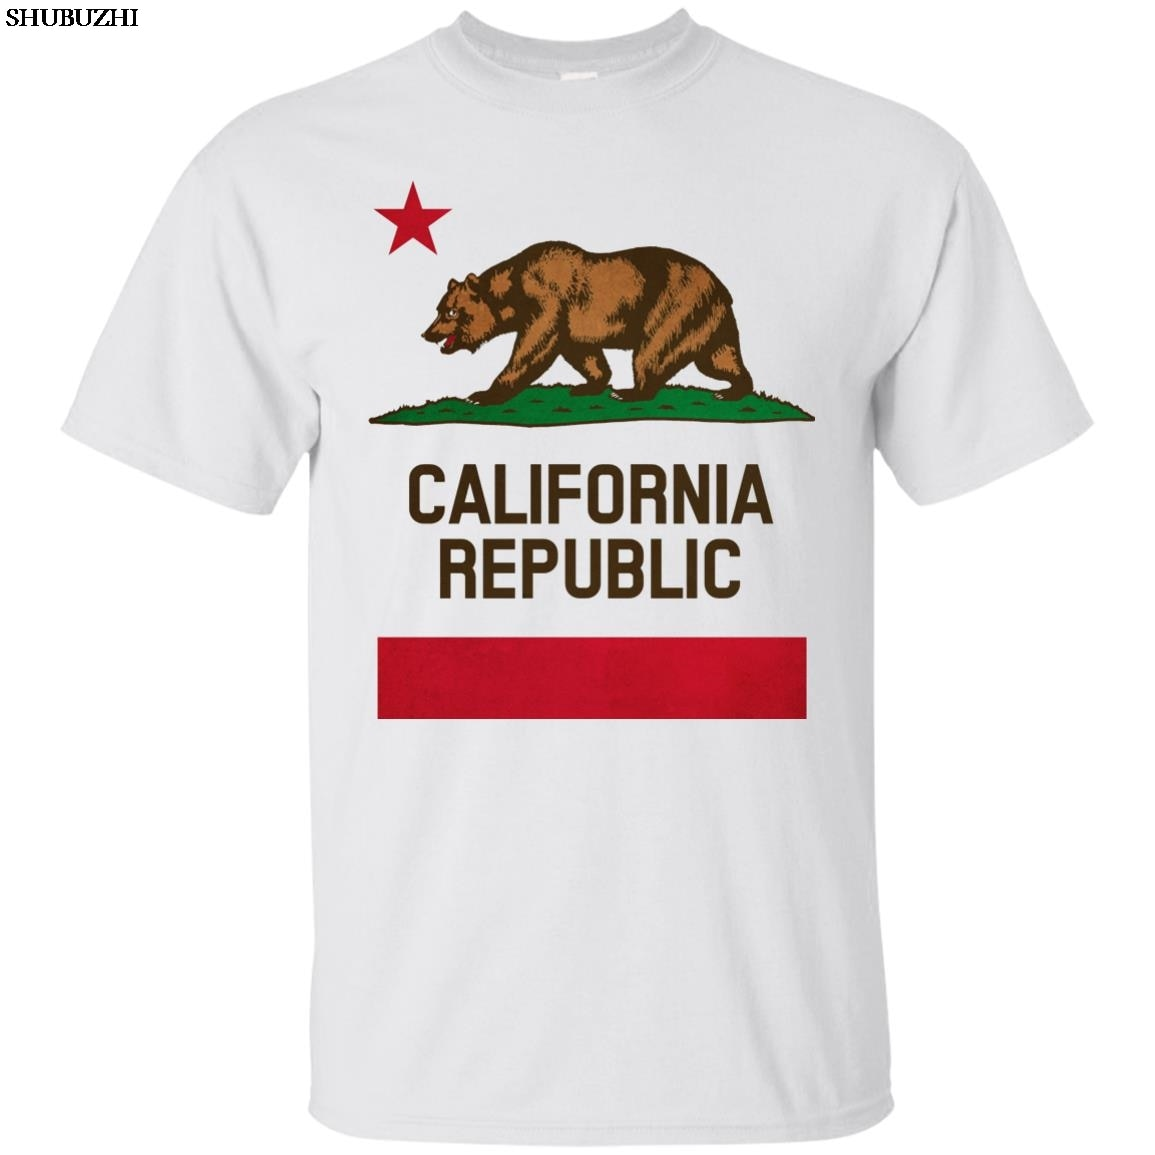 California, State, флаг, Республика, медведь, Лос-Анжелес, Сакраменто, Сан-Франсиско, мультяшная Футболка Мужская Унисекс Новая модная футболка